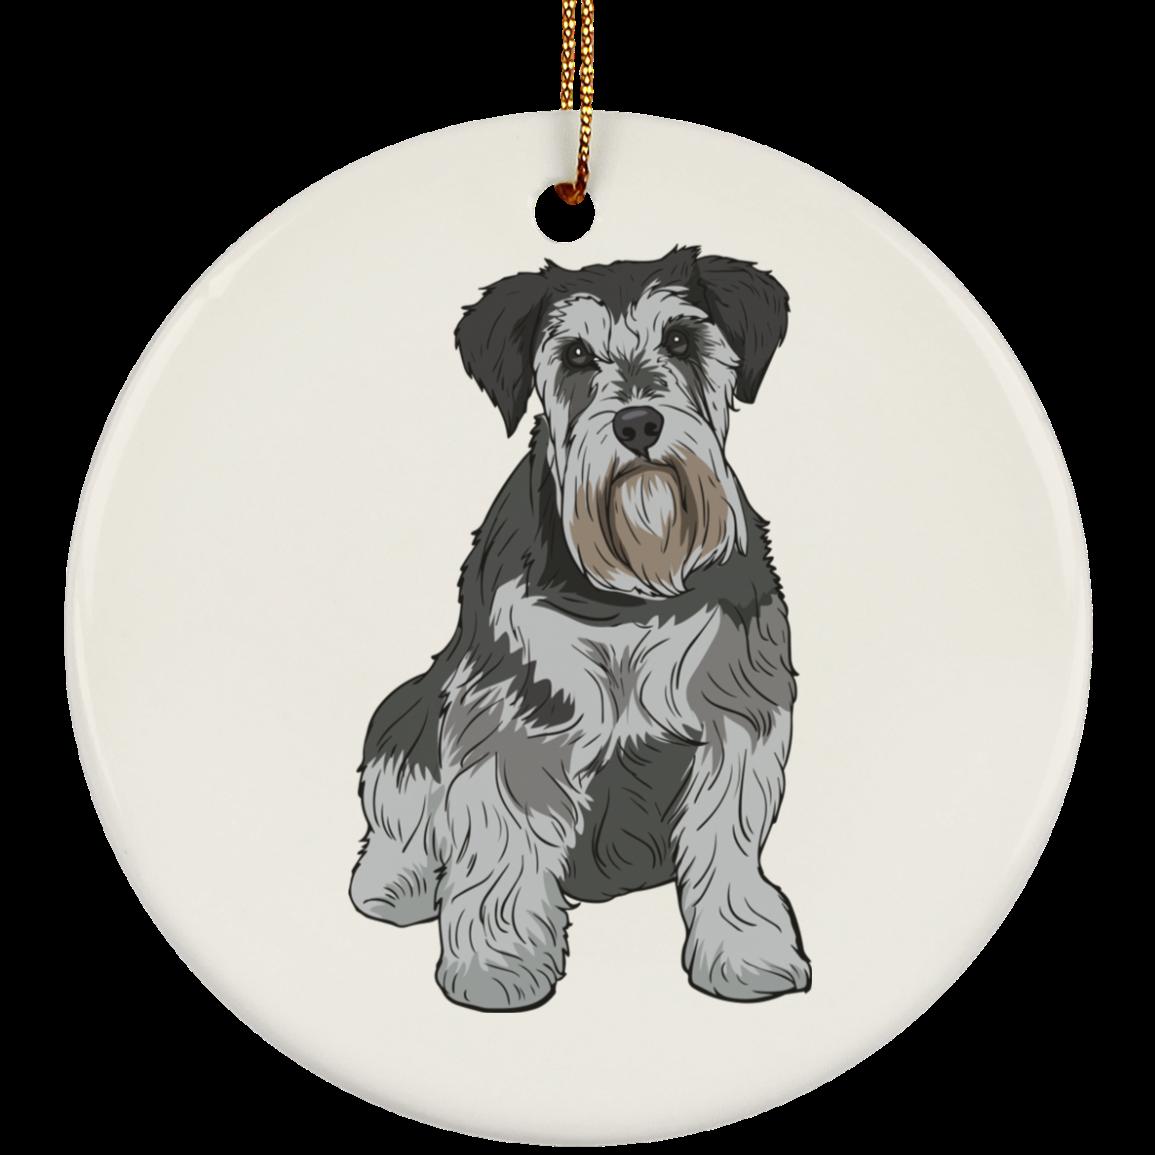 Miniature Schnauzer Dog Ornament Christmas Tree Ornaments Holiday